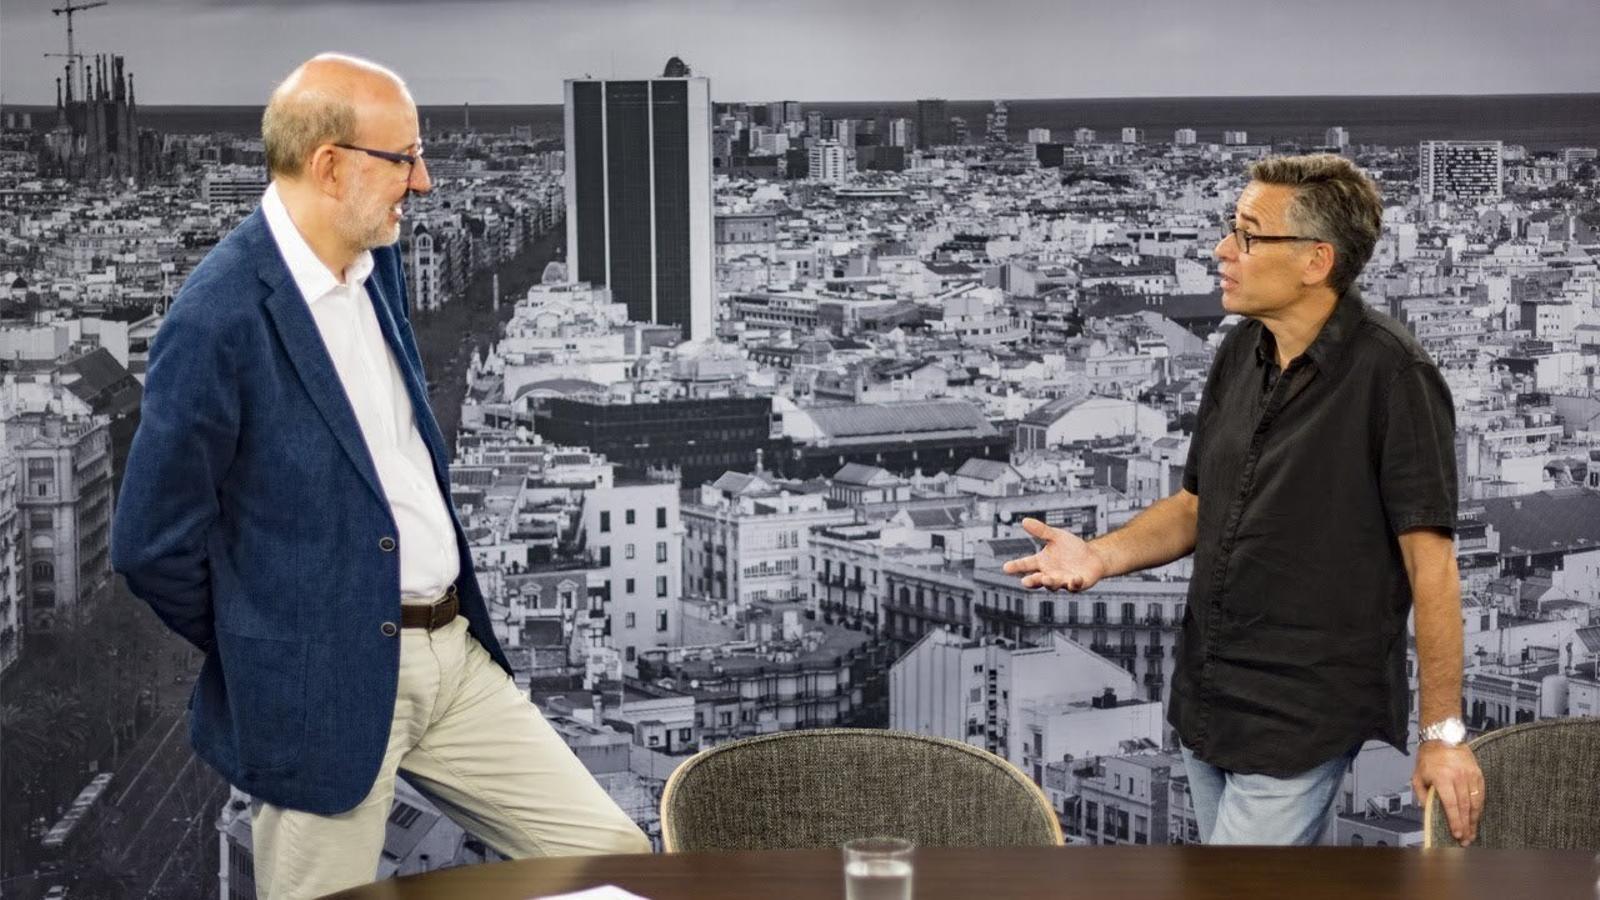 Entrevista d'Antoni Bassas a Jordi Galceran